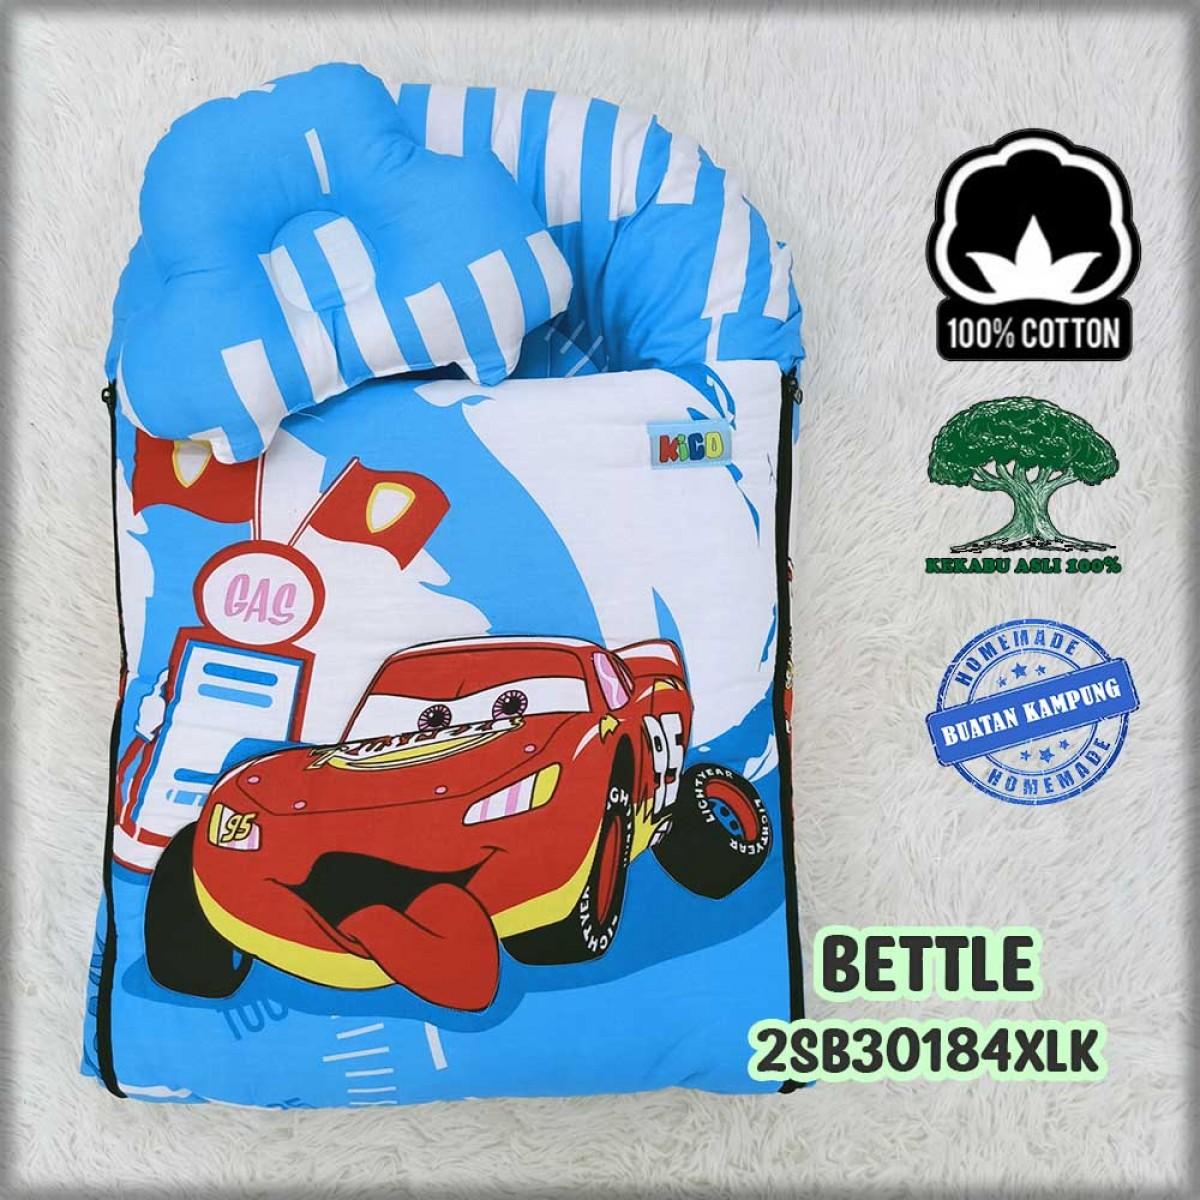 Bettle - Kico Baby Center